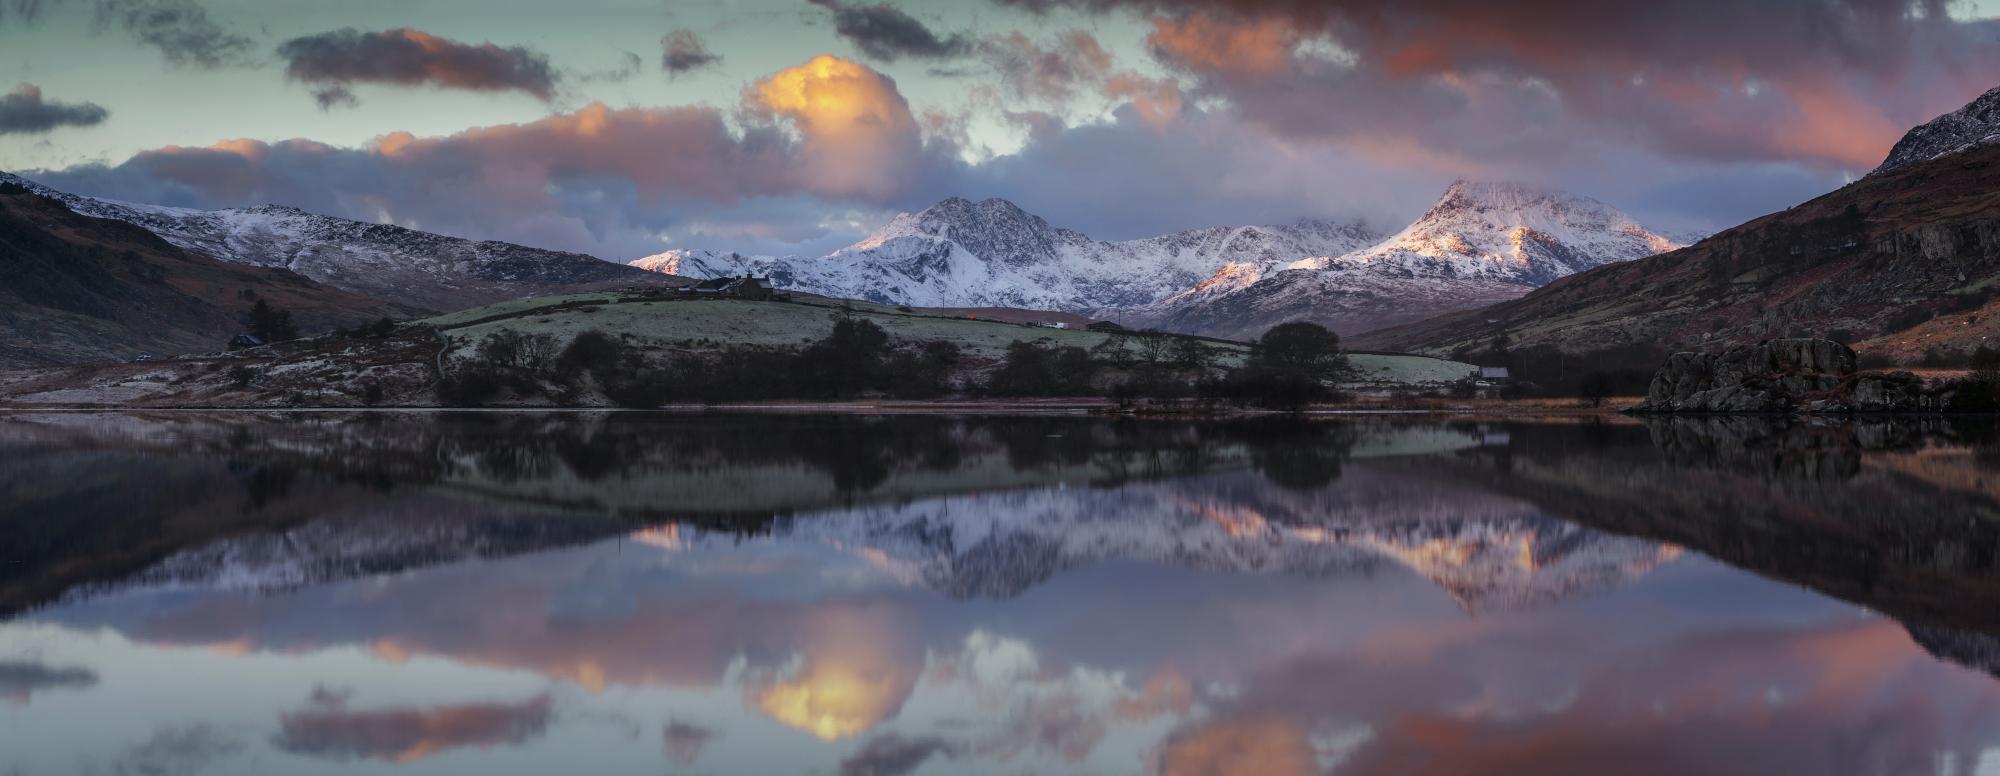 Landscape photography /Llynau Mymbyr Snowdon Horseshoe